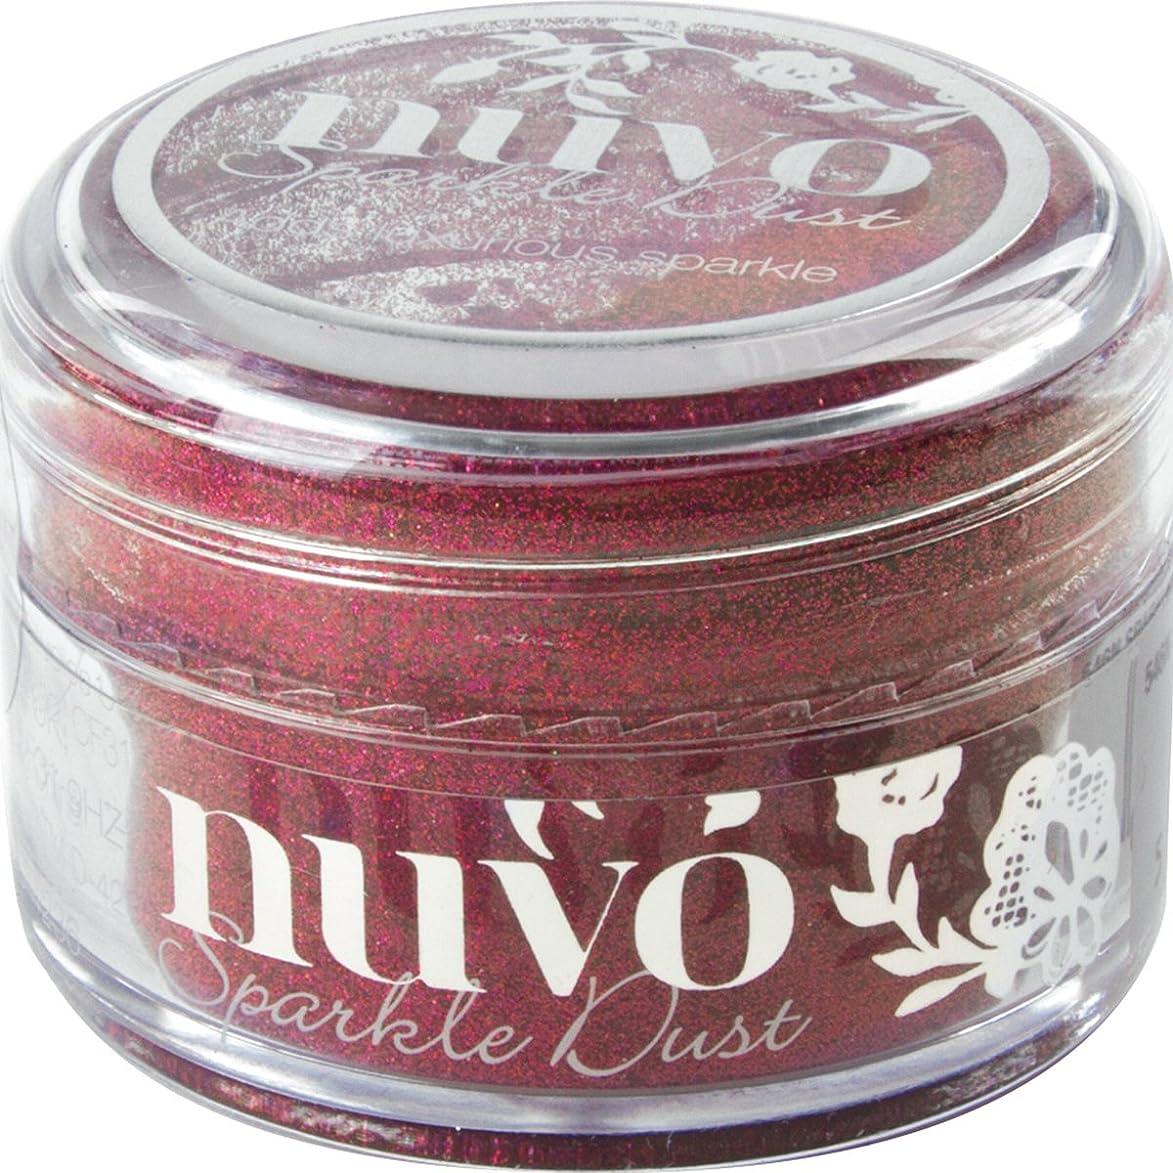 TONIC STUDIOS 546N Nuvo Sparkle Dust-Raspberry Bliss vui455403983705